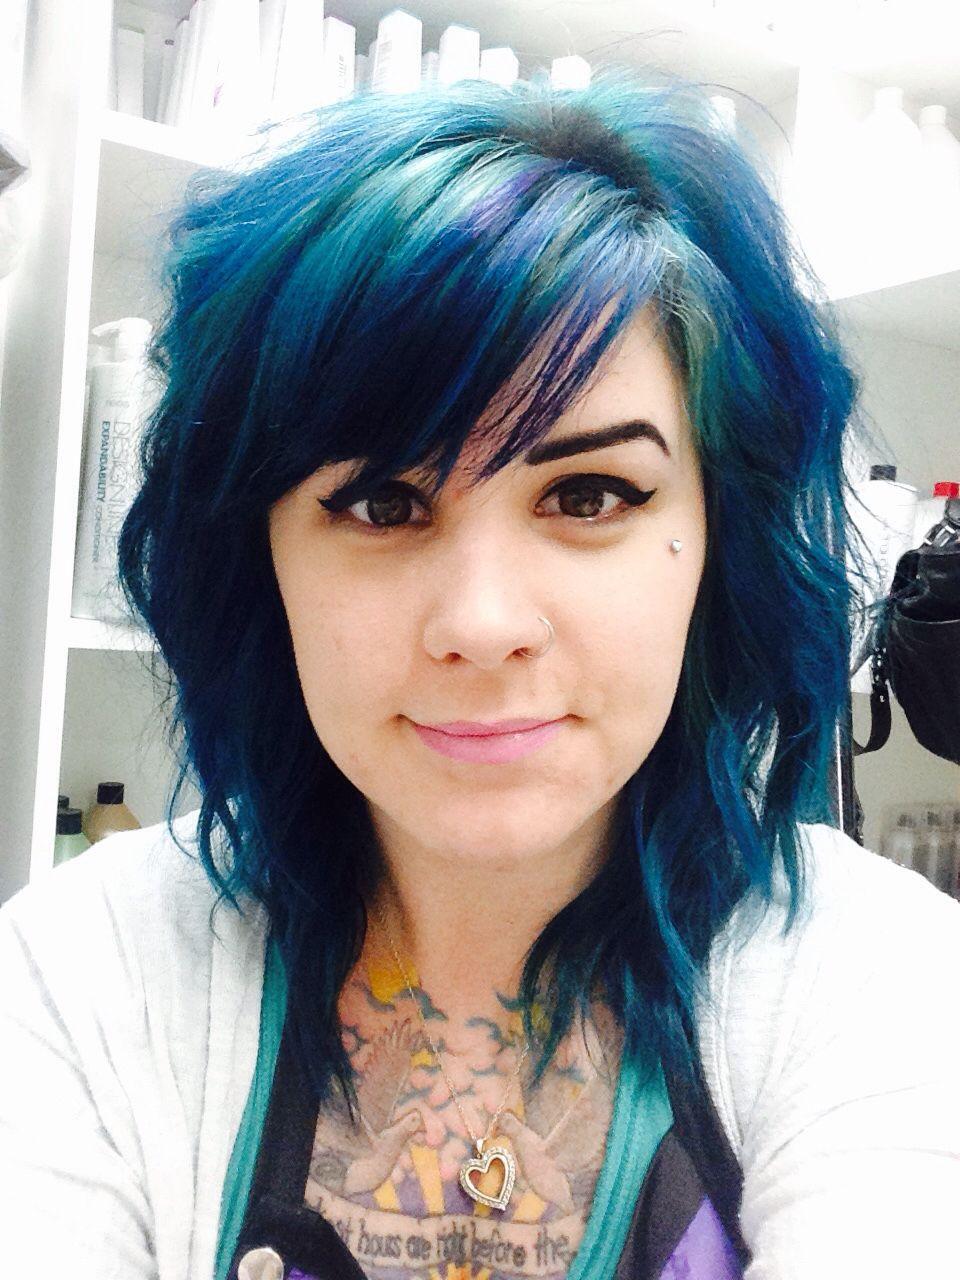 Pravana teal blue hair that i did on myself fashion pravana teal blue hair that i did on myself solutioingenieria Images